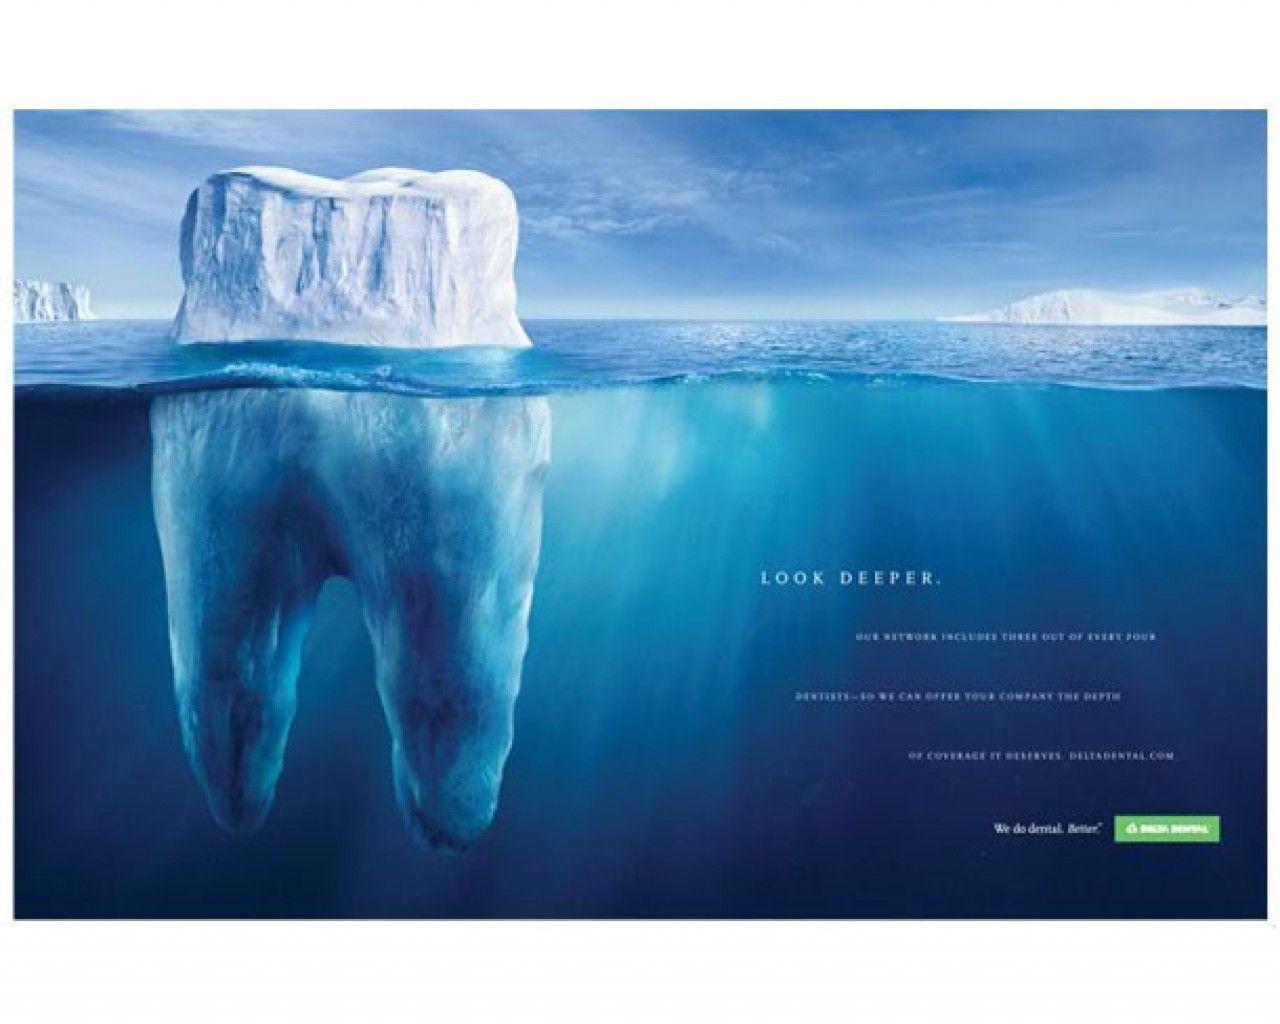 Dental Computer Wallpapers   Top Dental Computer Backgrounds 1280x1024